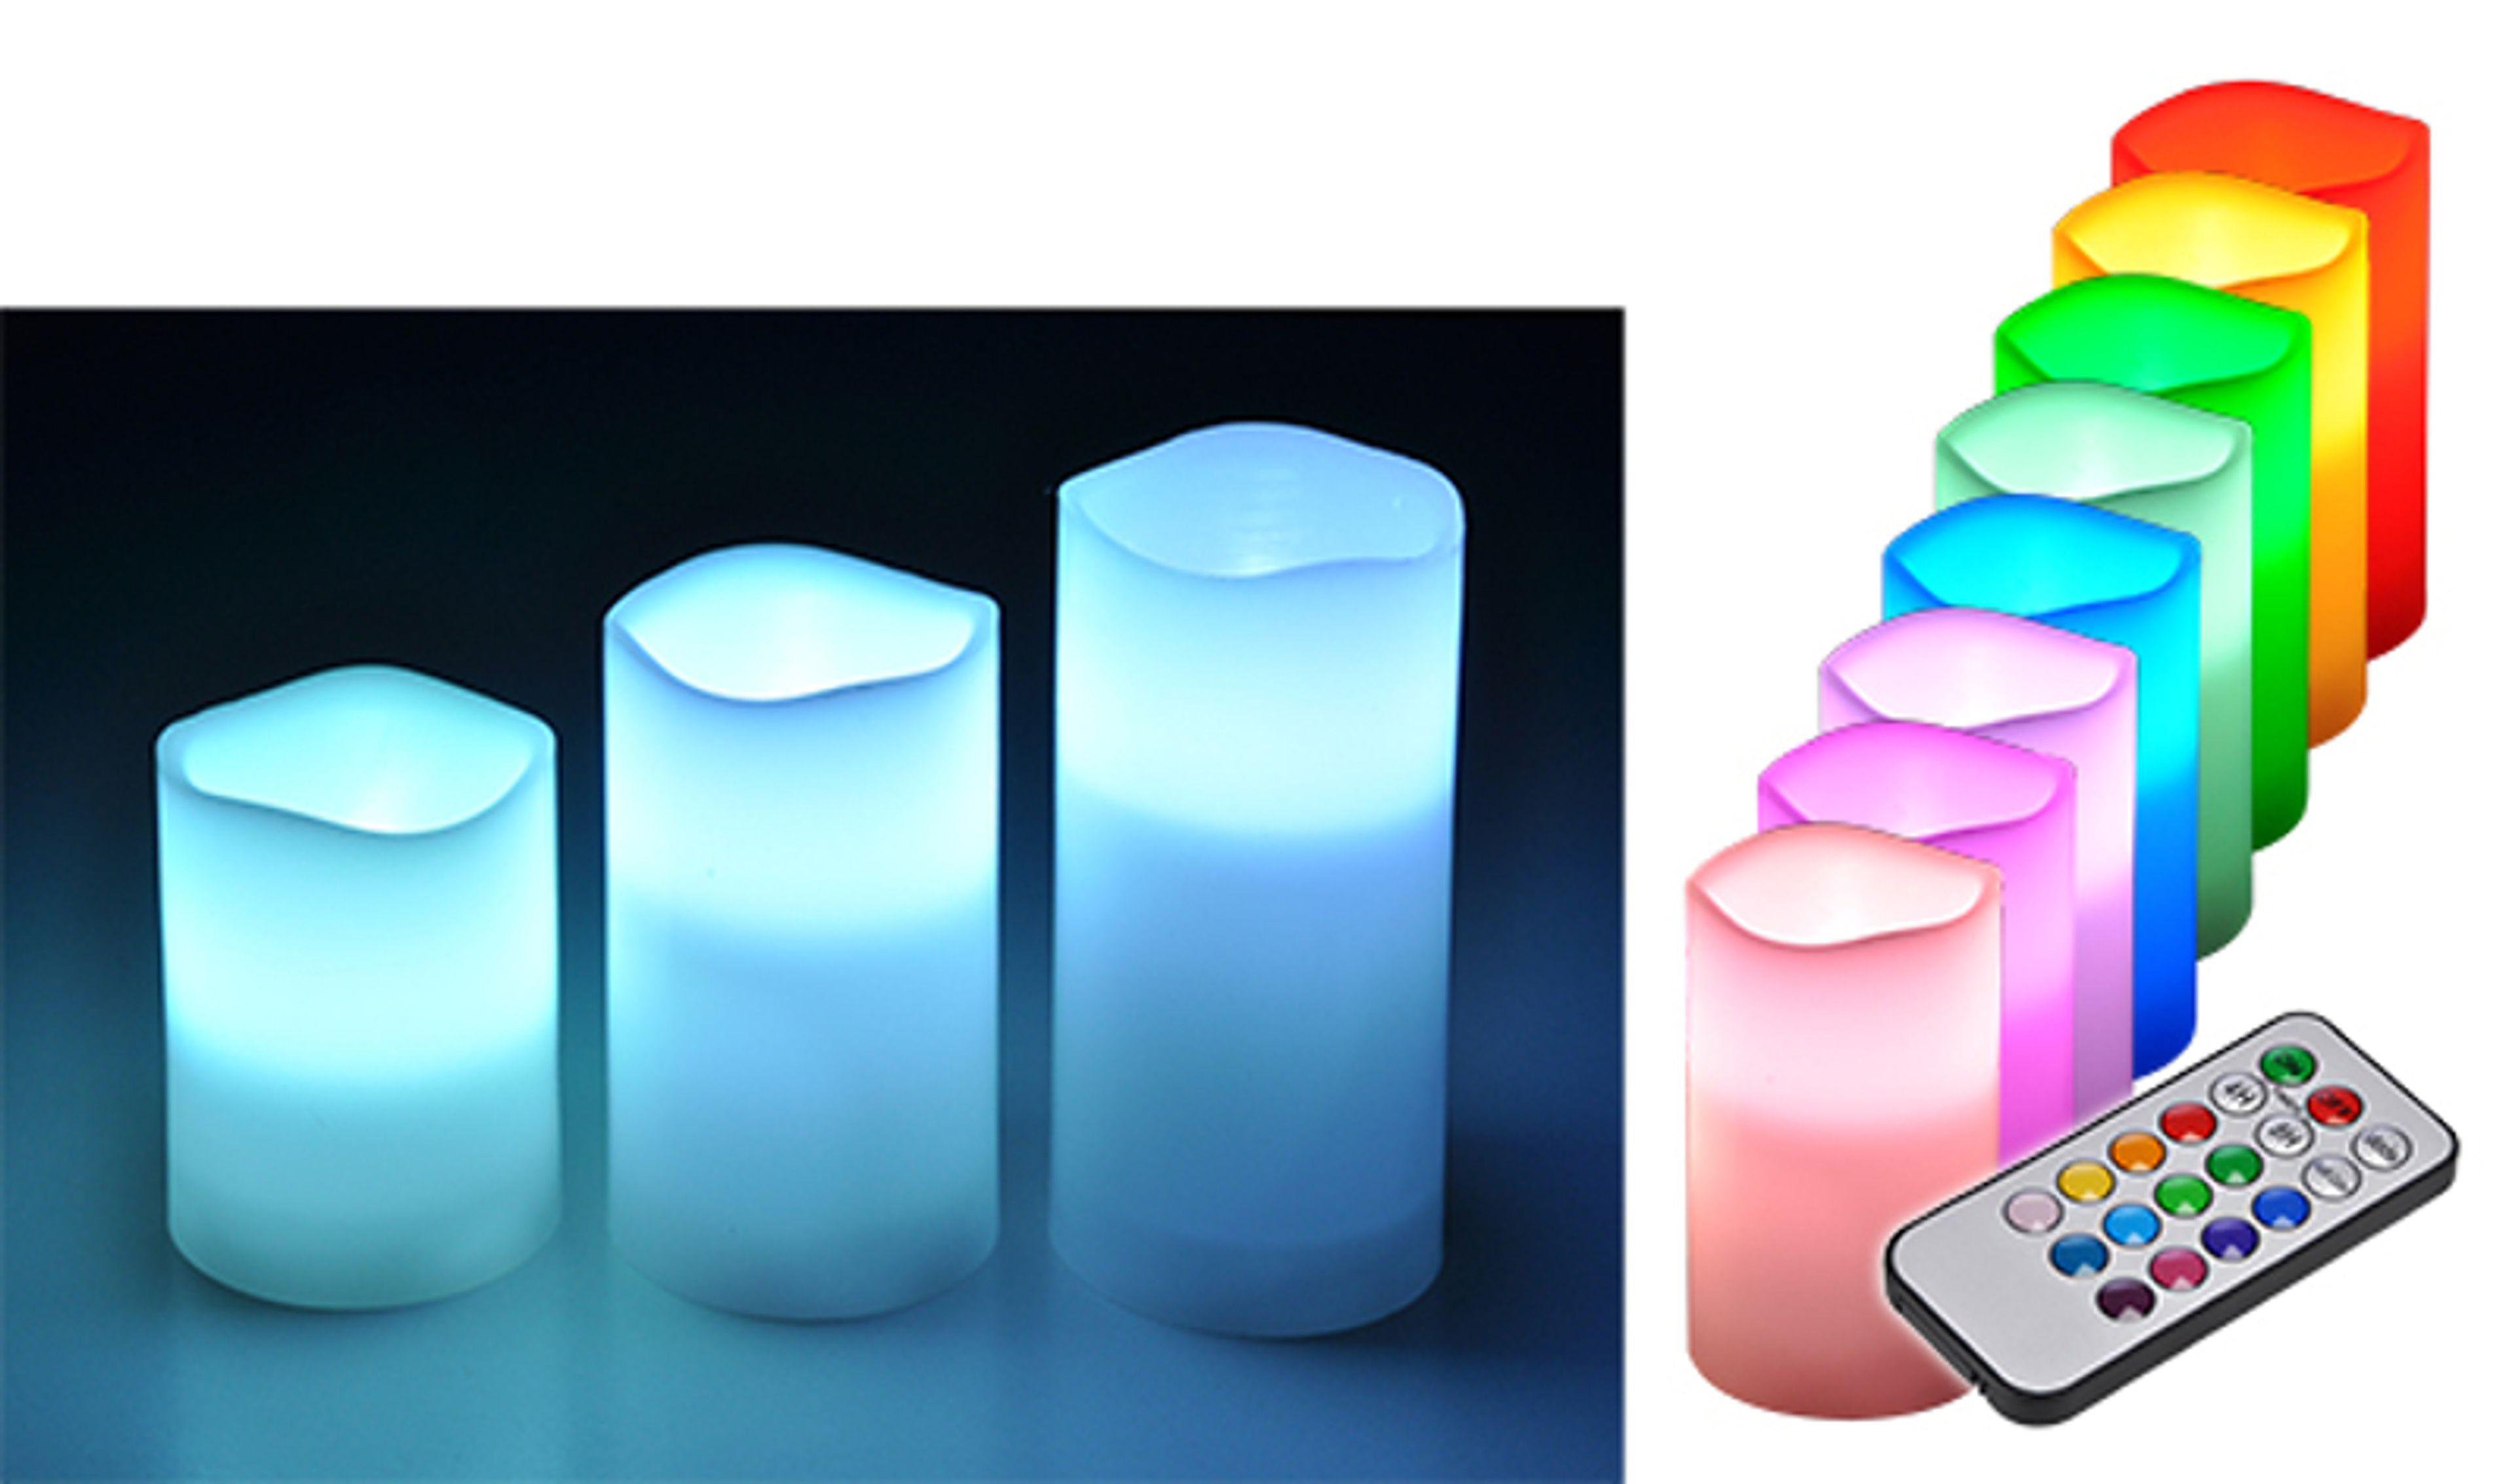 3er set led flammenlose kerzen s ulenkerze wachskerze stumpenkerze farbwechsel haushaltswaren. Black Bedroom Furniture Sets. Home Design Ideas